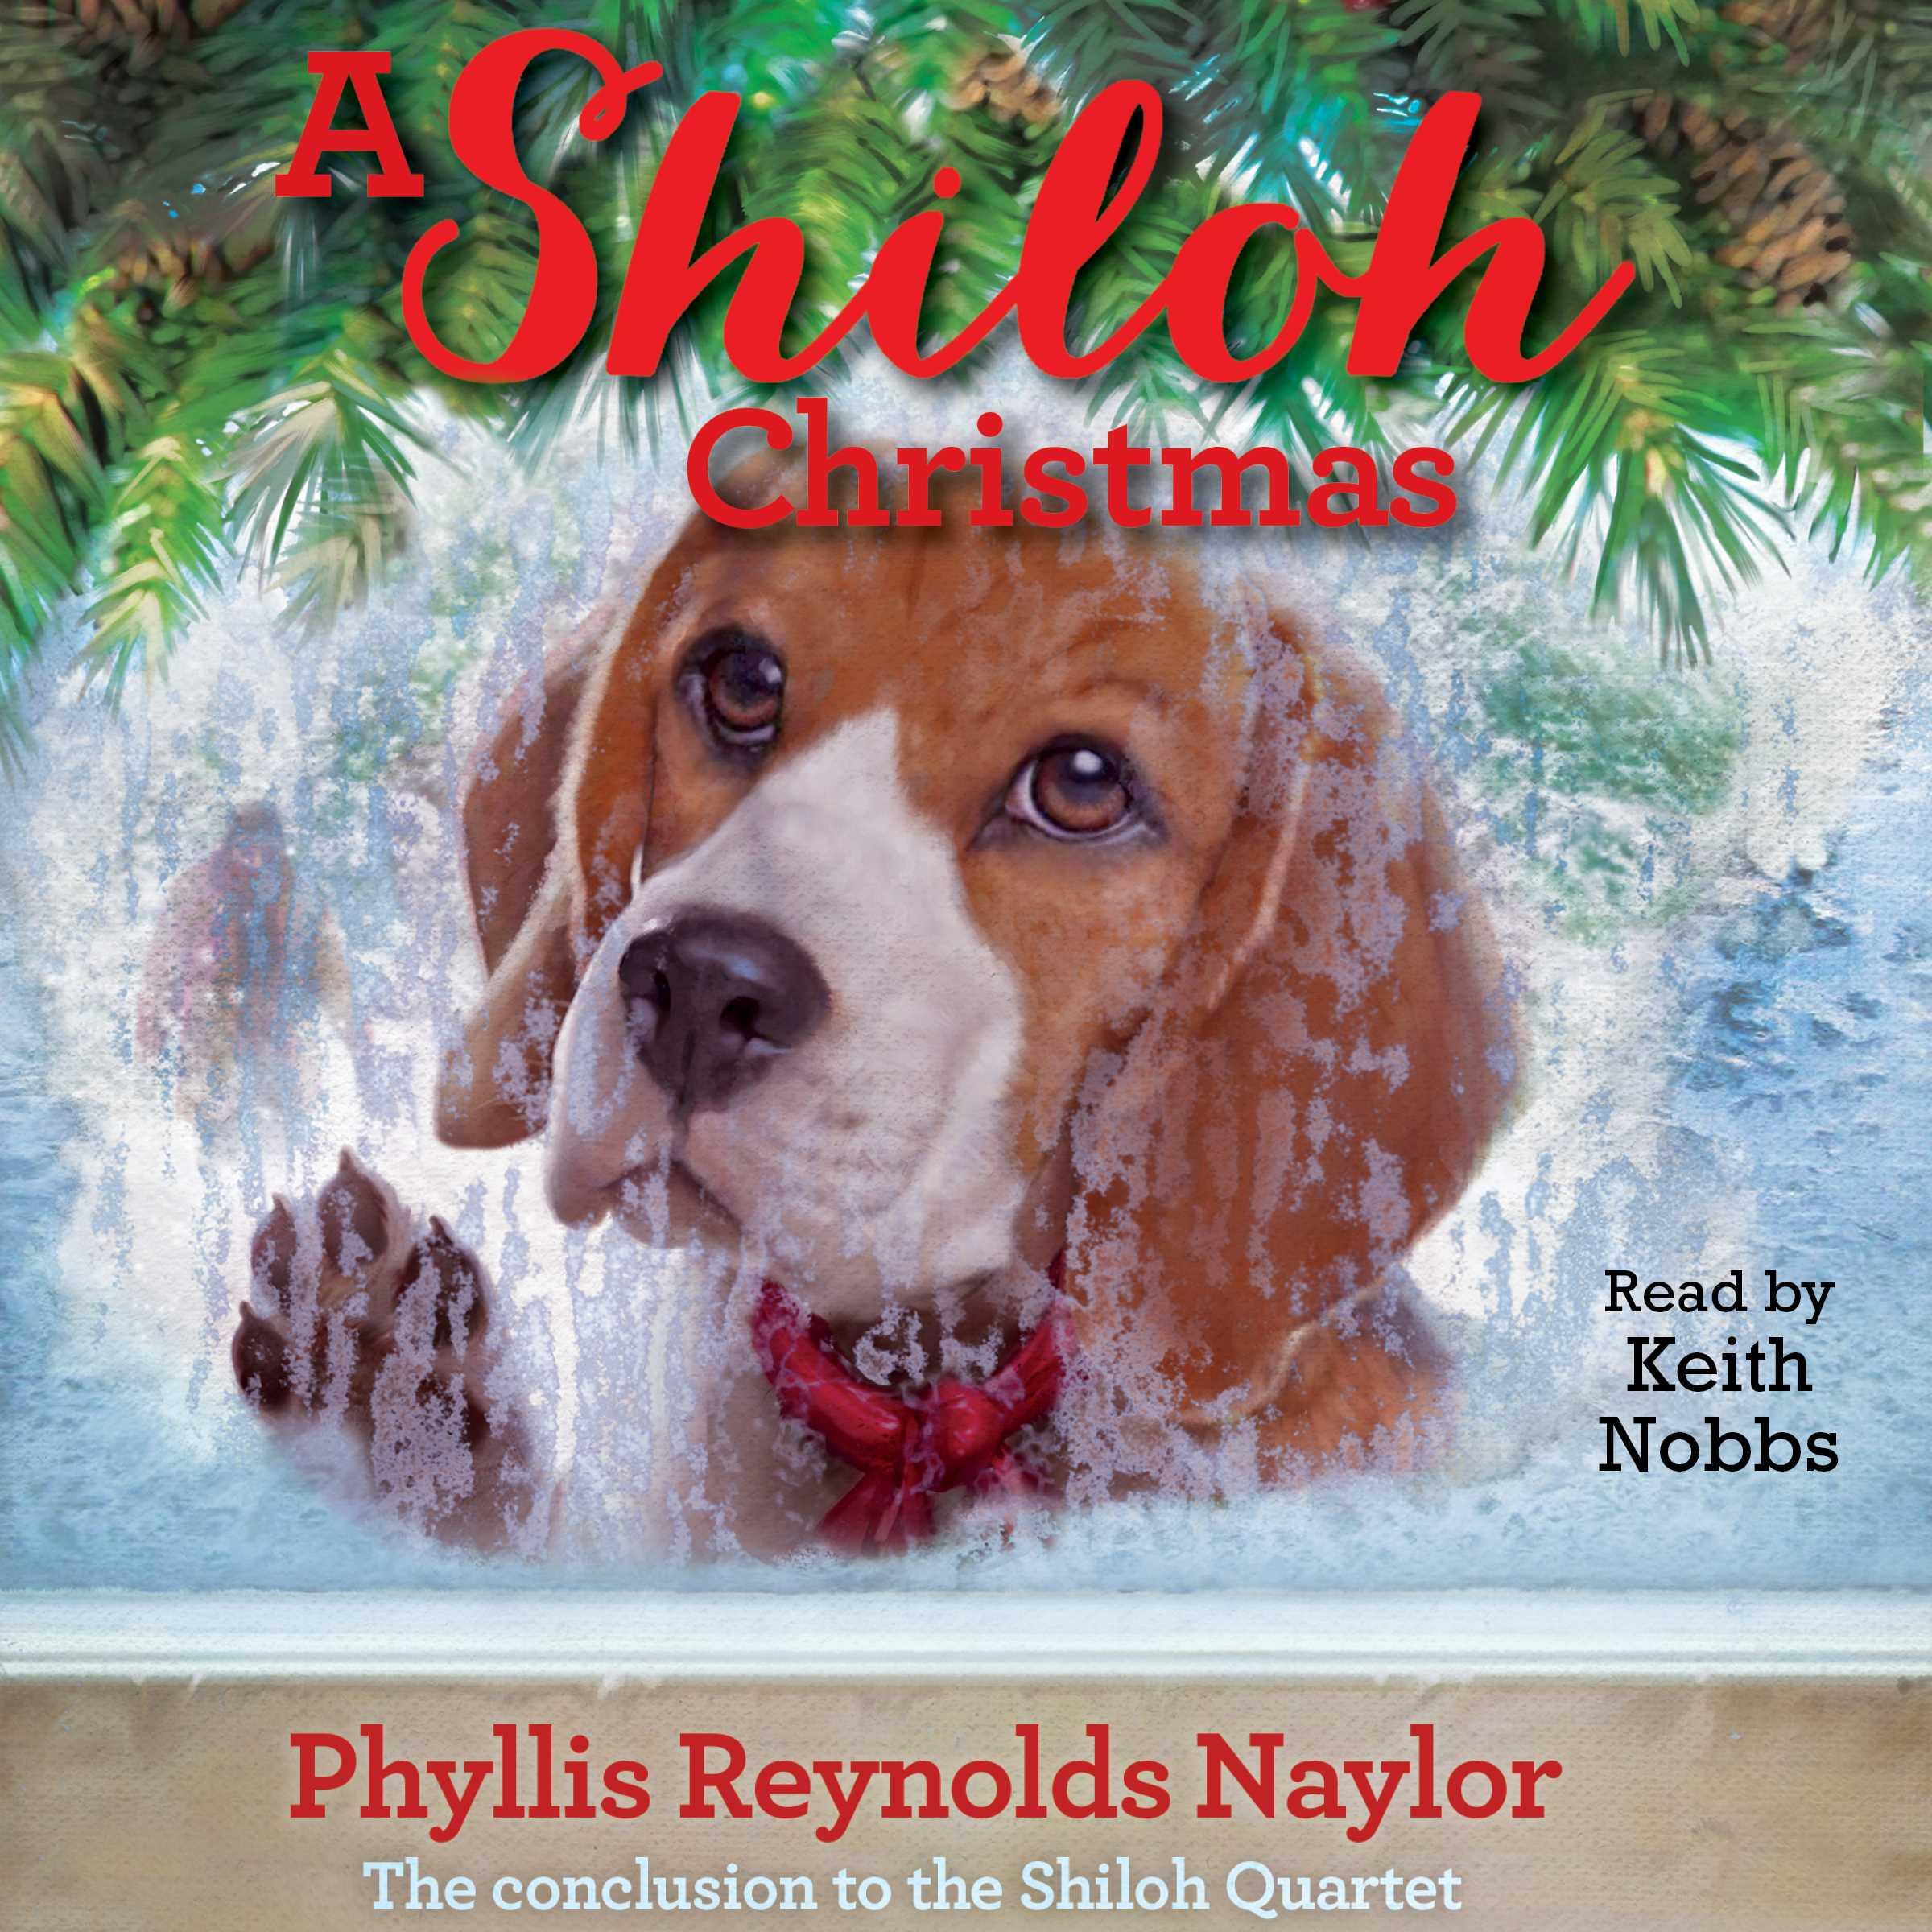 A shiloh christmas 9781442391390 hr